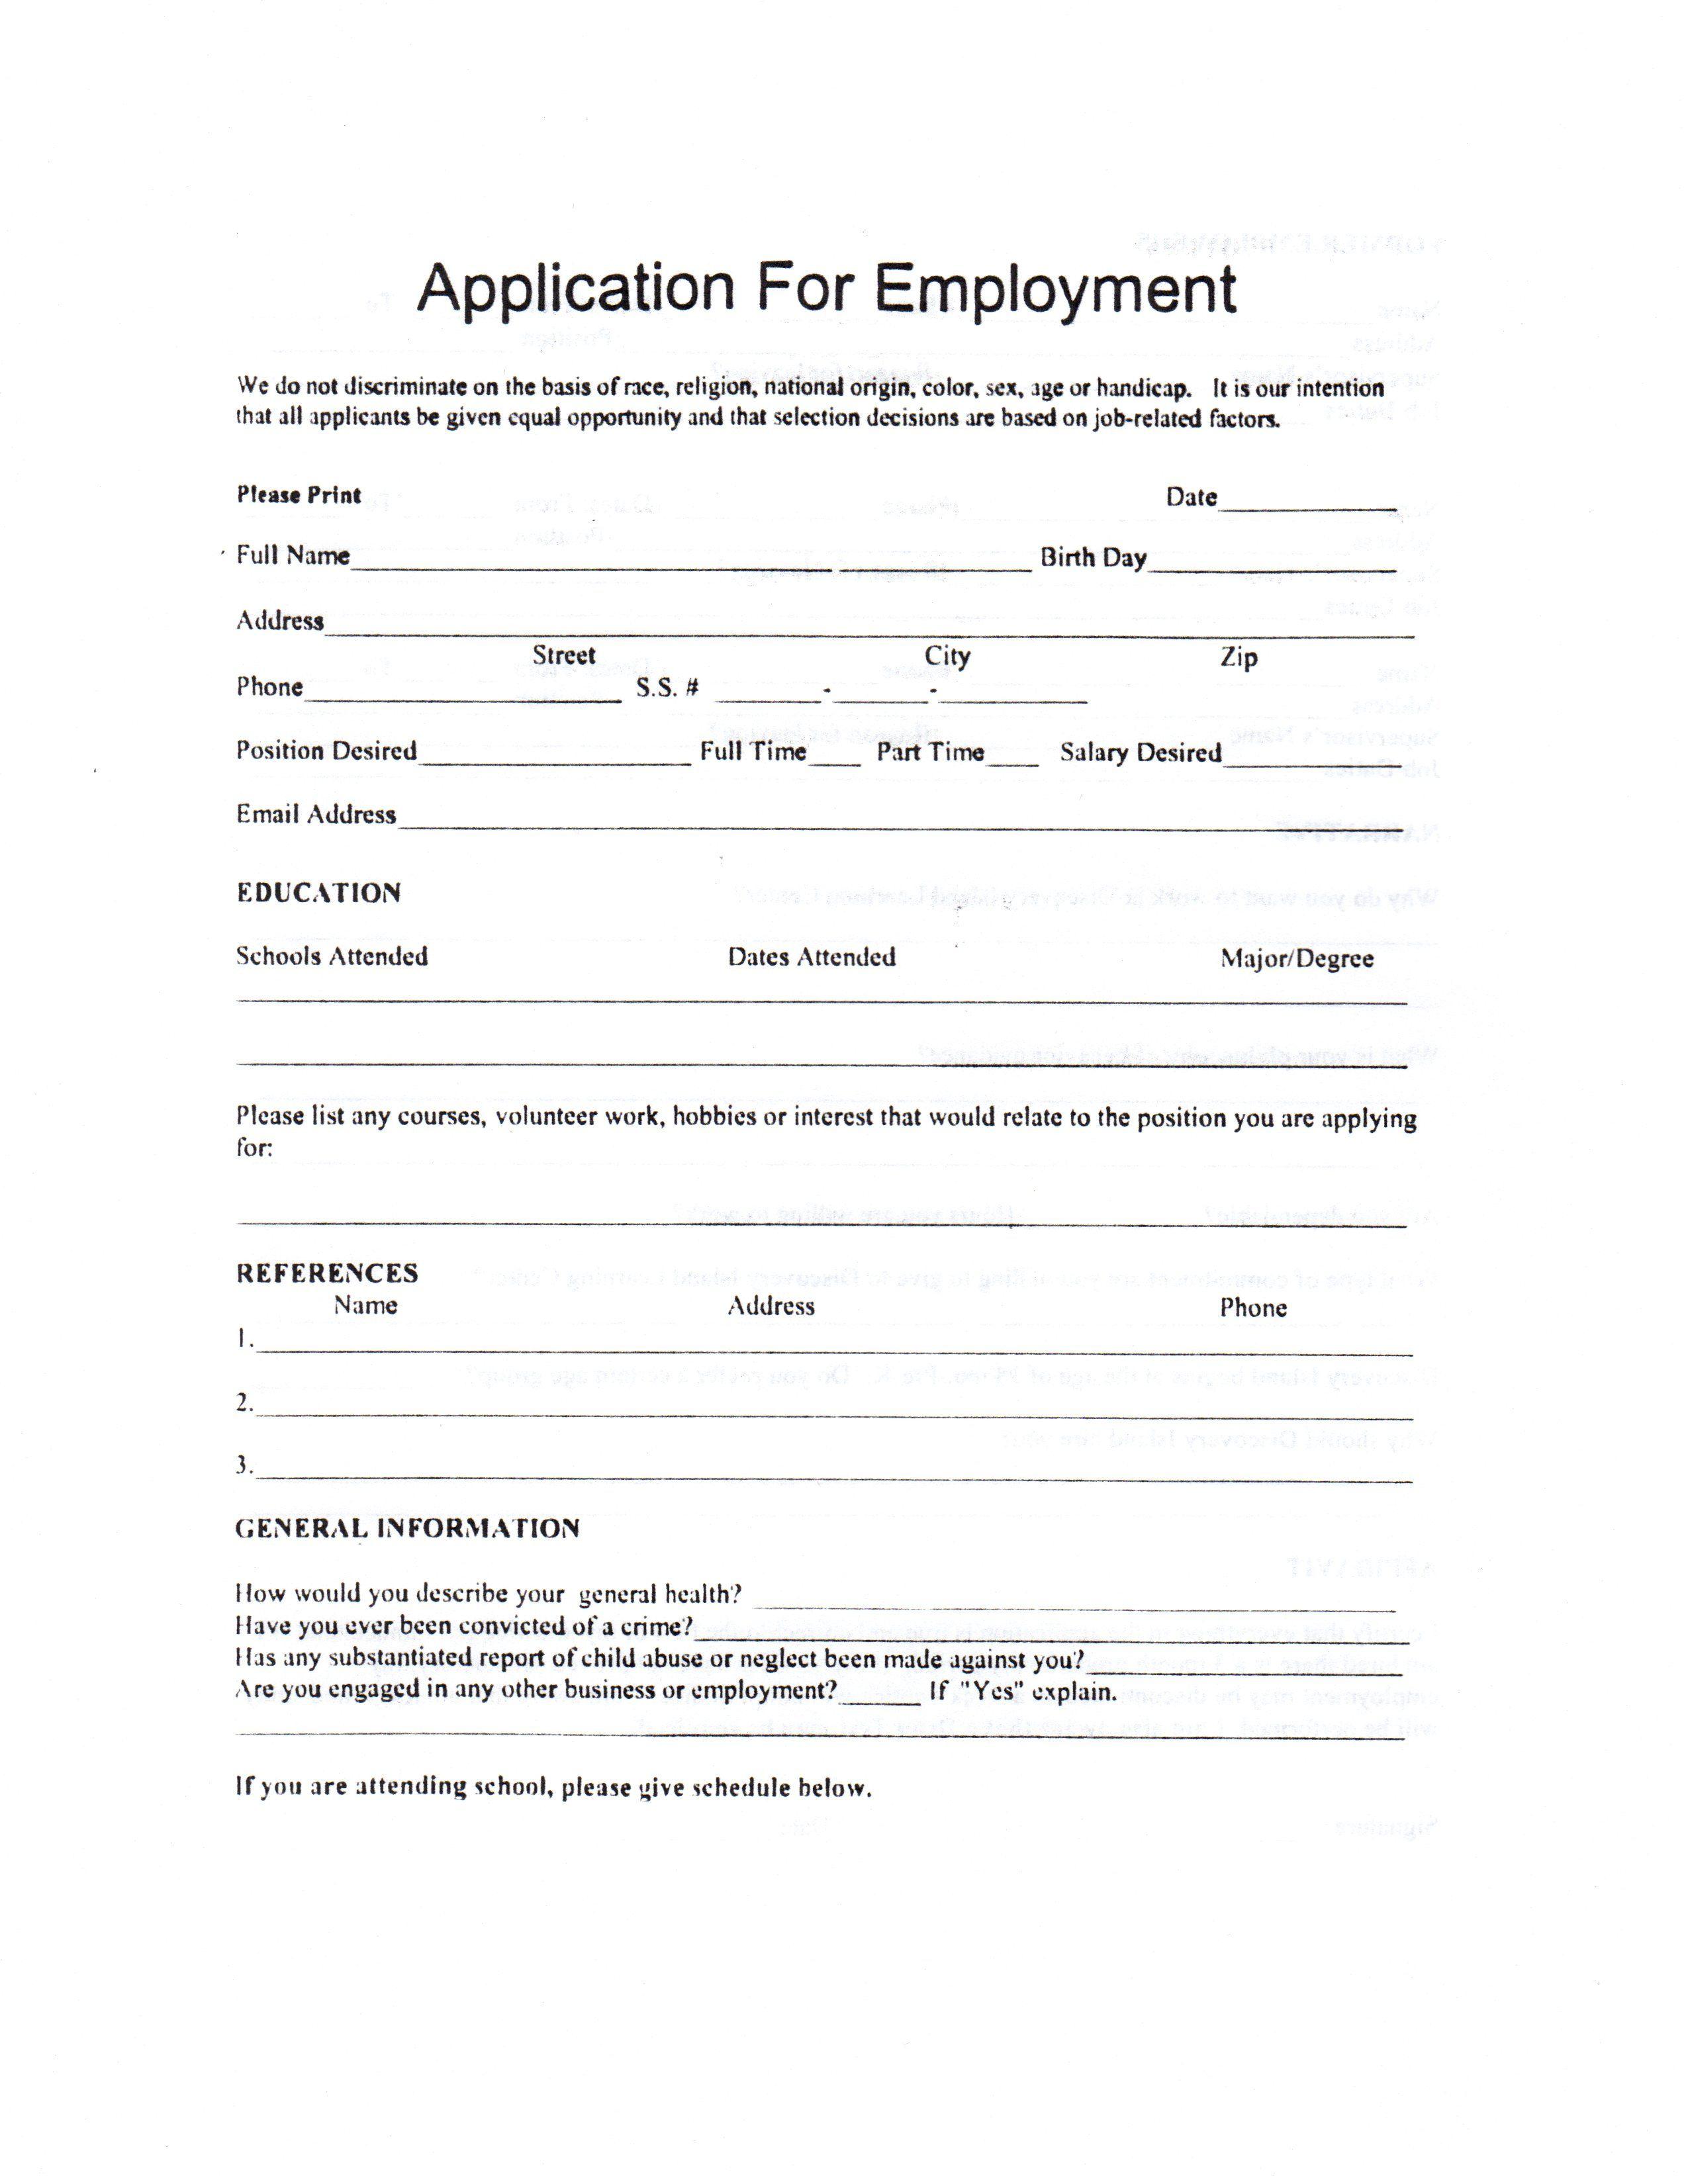 Salon Application Employment